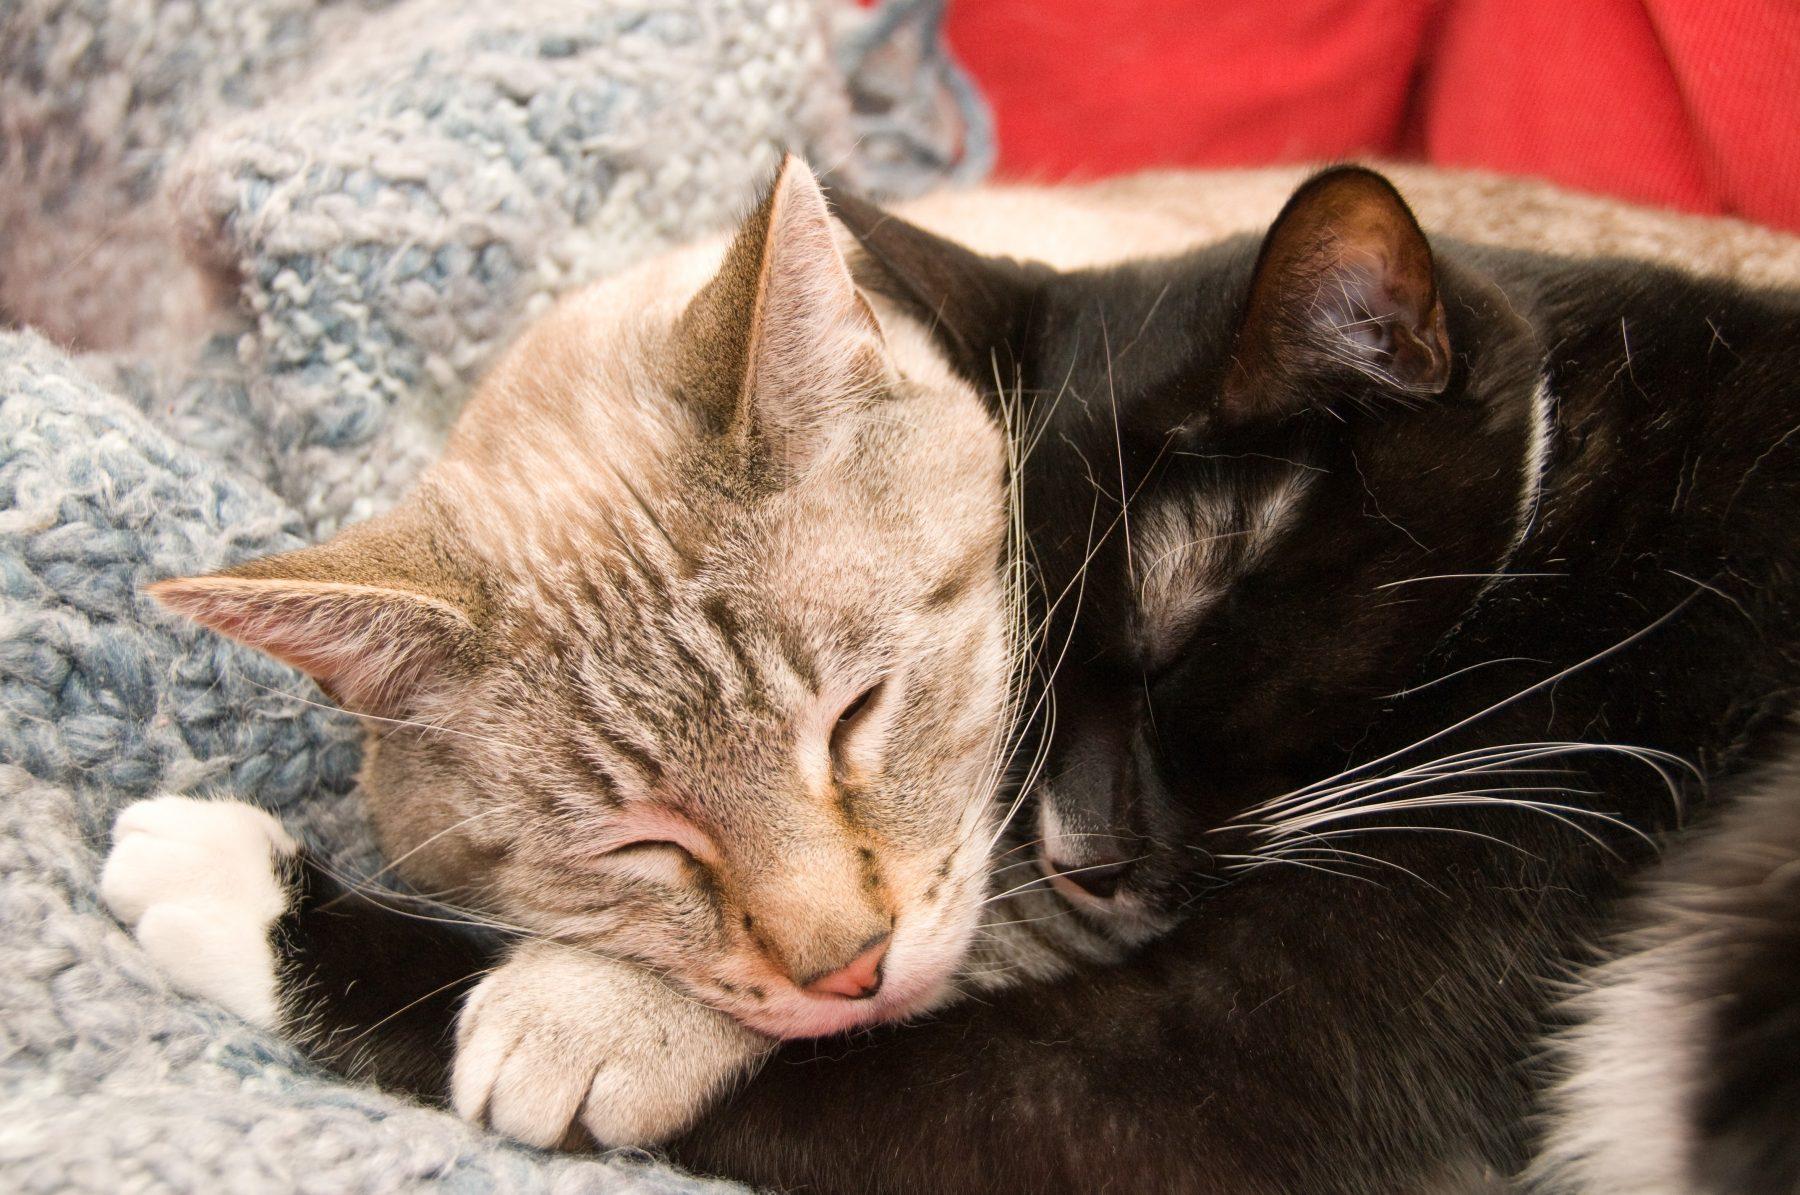 cute-love-kitten-cat-mammal-together-984413-pxhere.com_